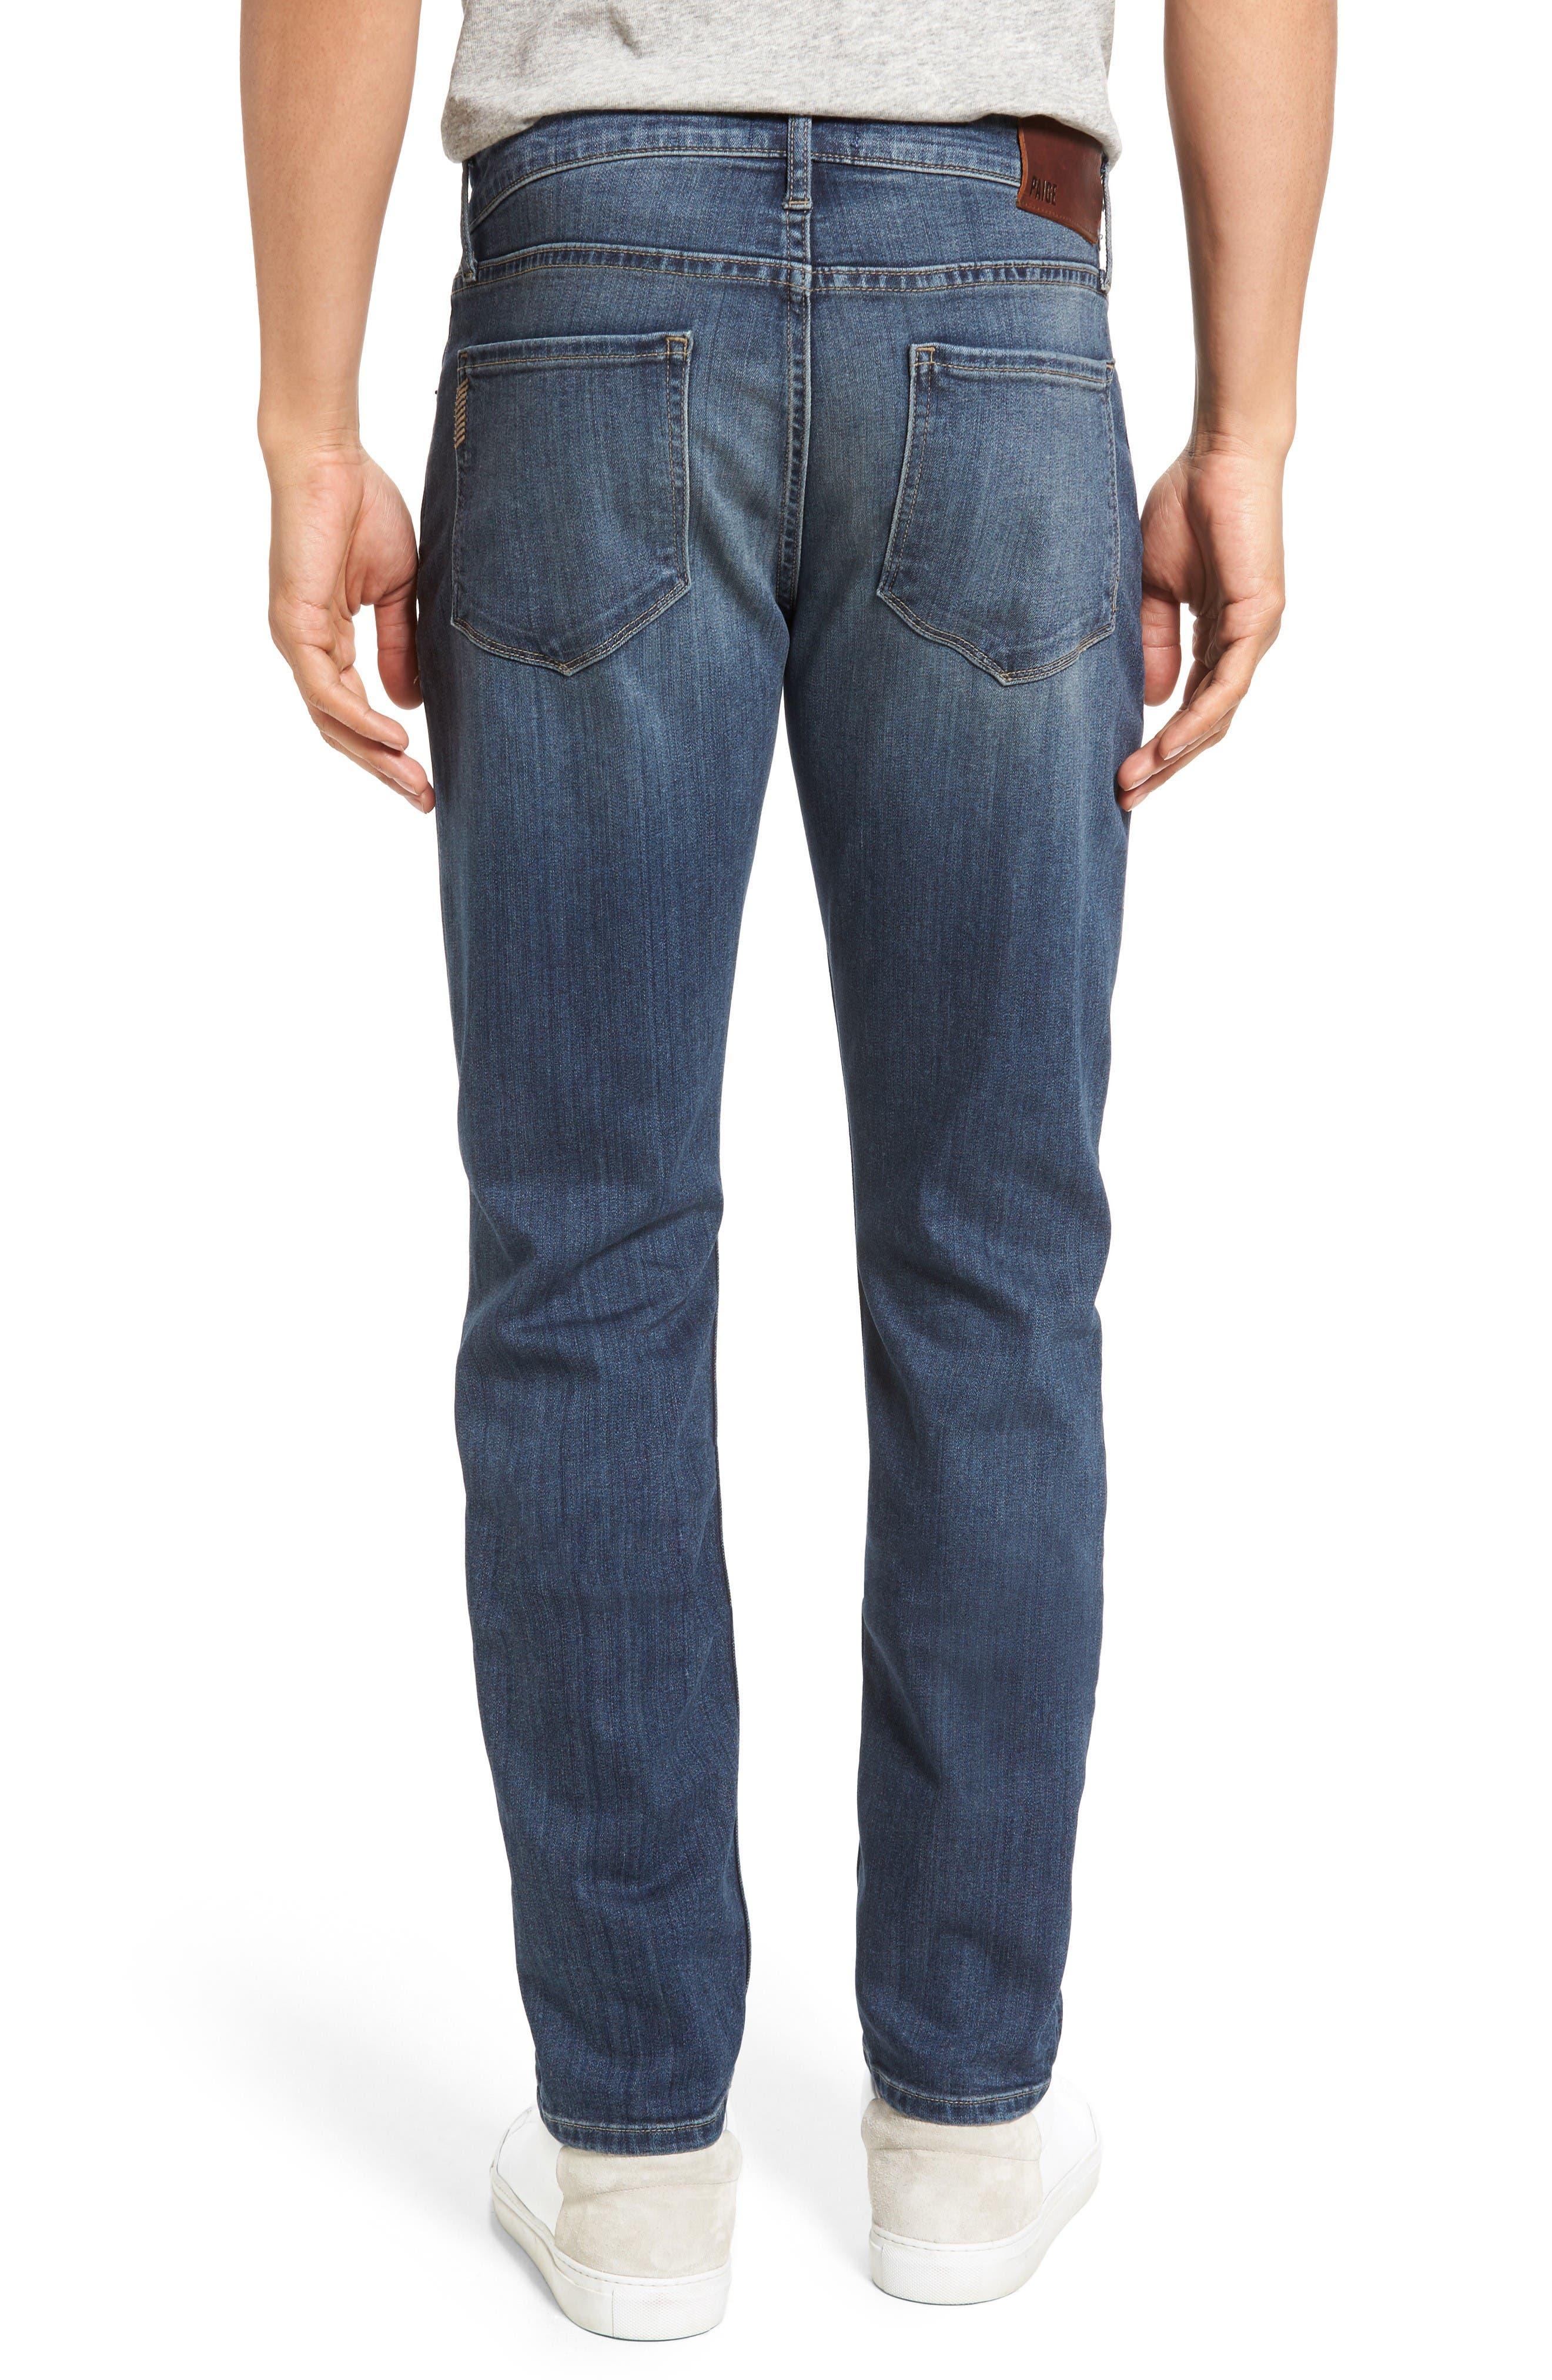 Transcend - Lennox Slim Fit Jeans,                             Alternate thumbnail 2, color,                             Elwood